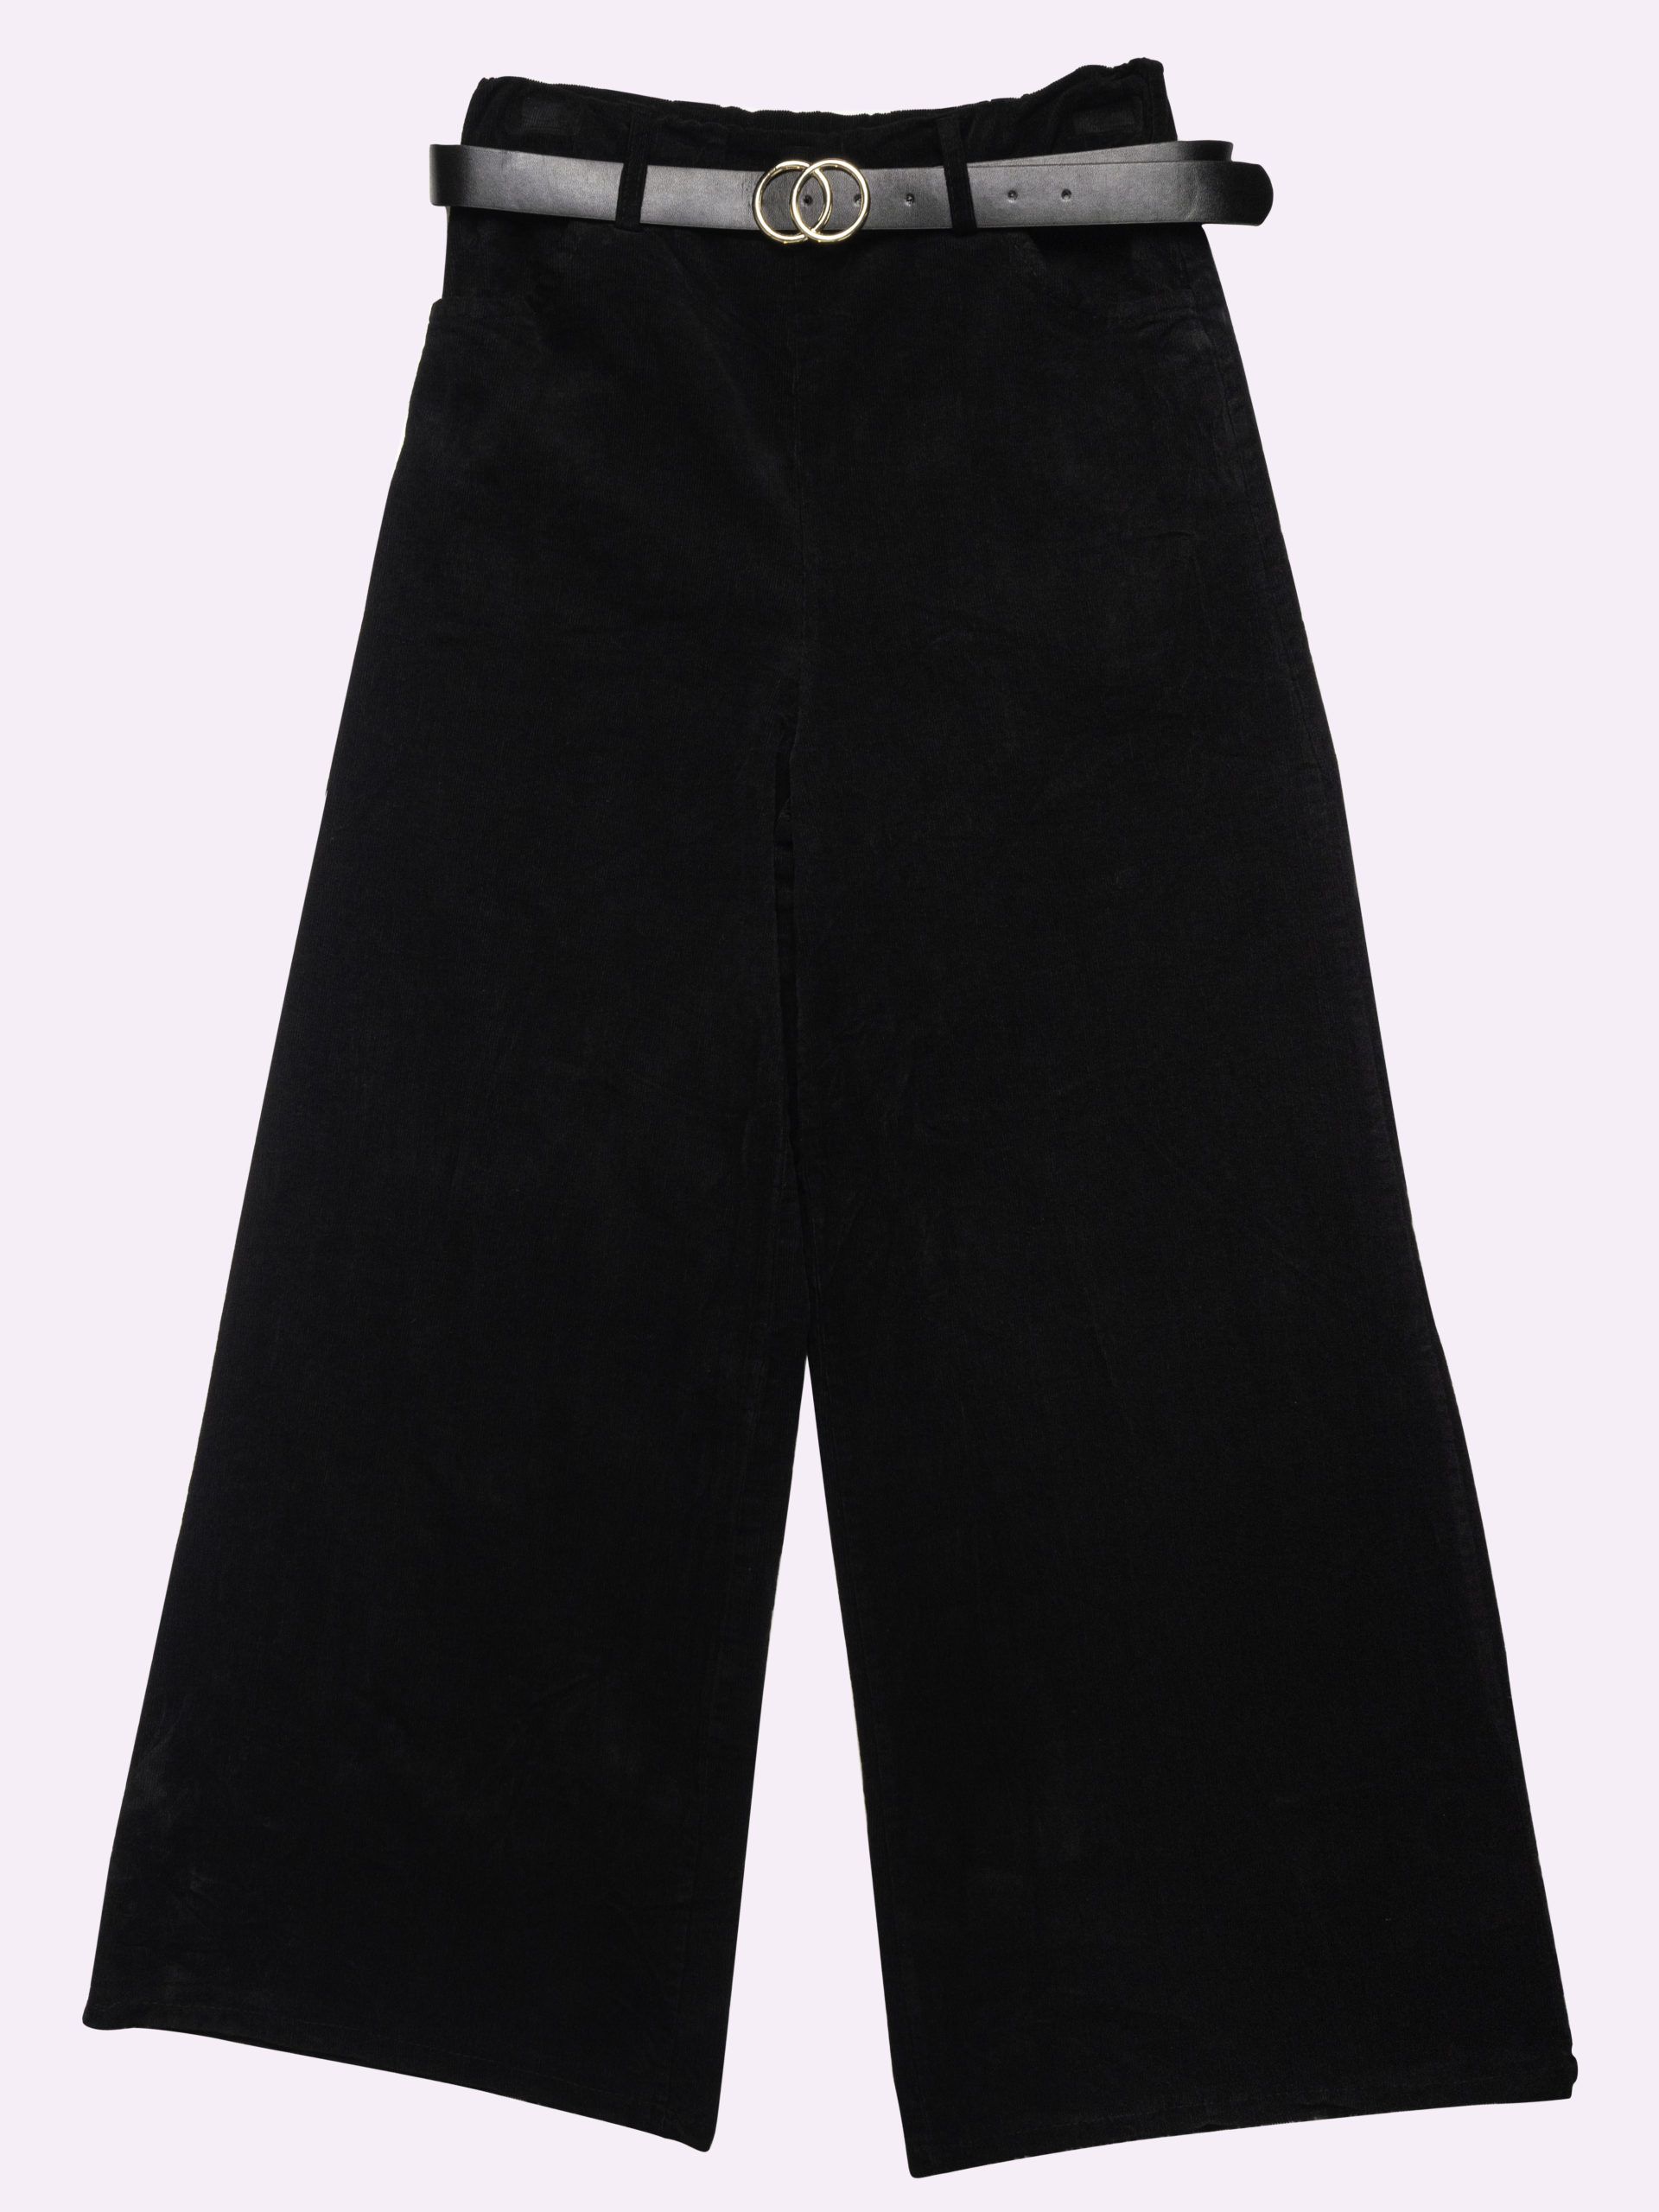 Pantaloni neri a palazzo con cintura